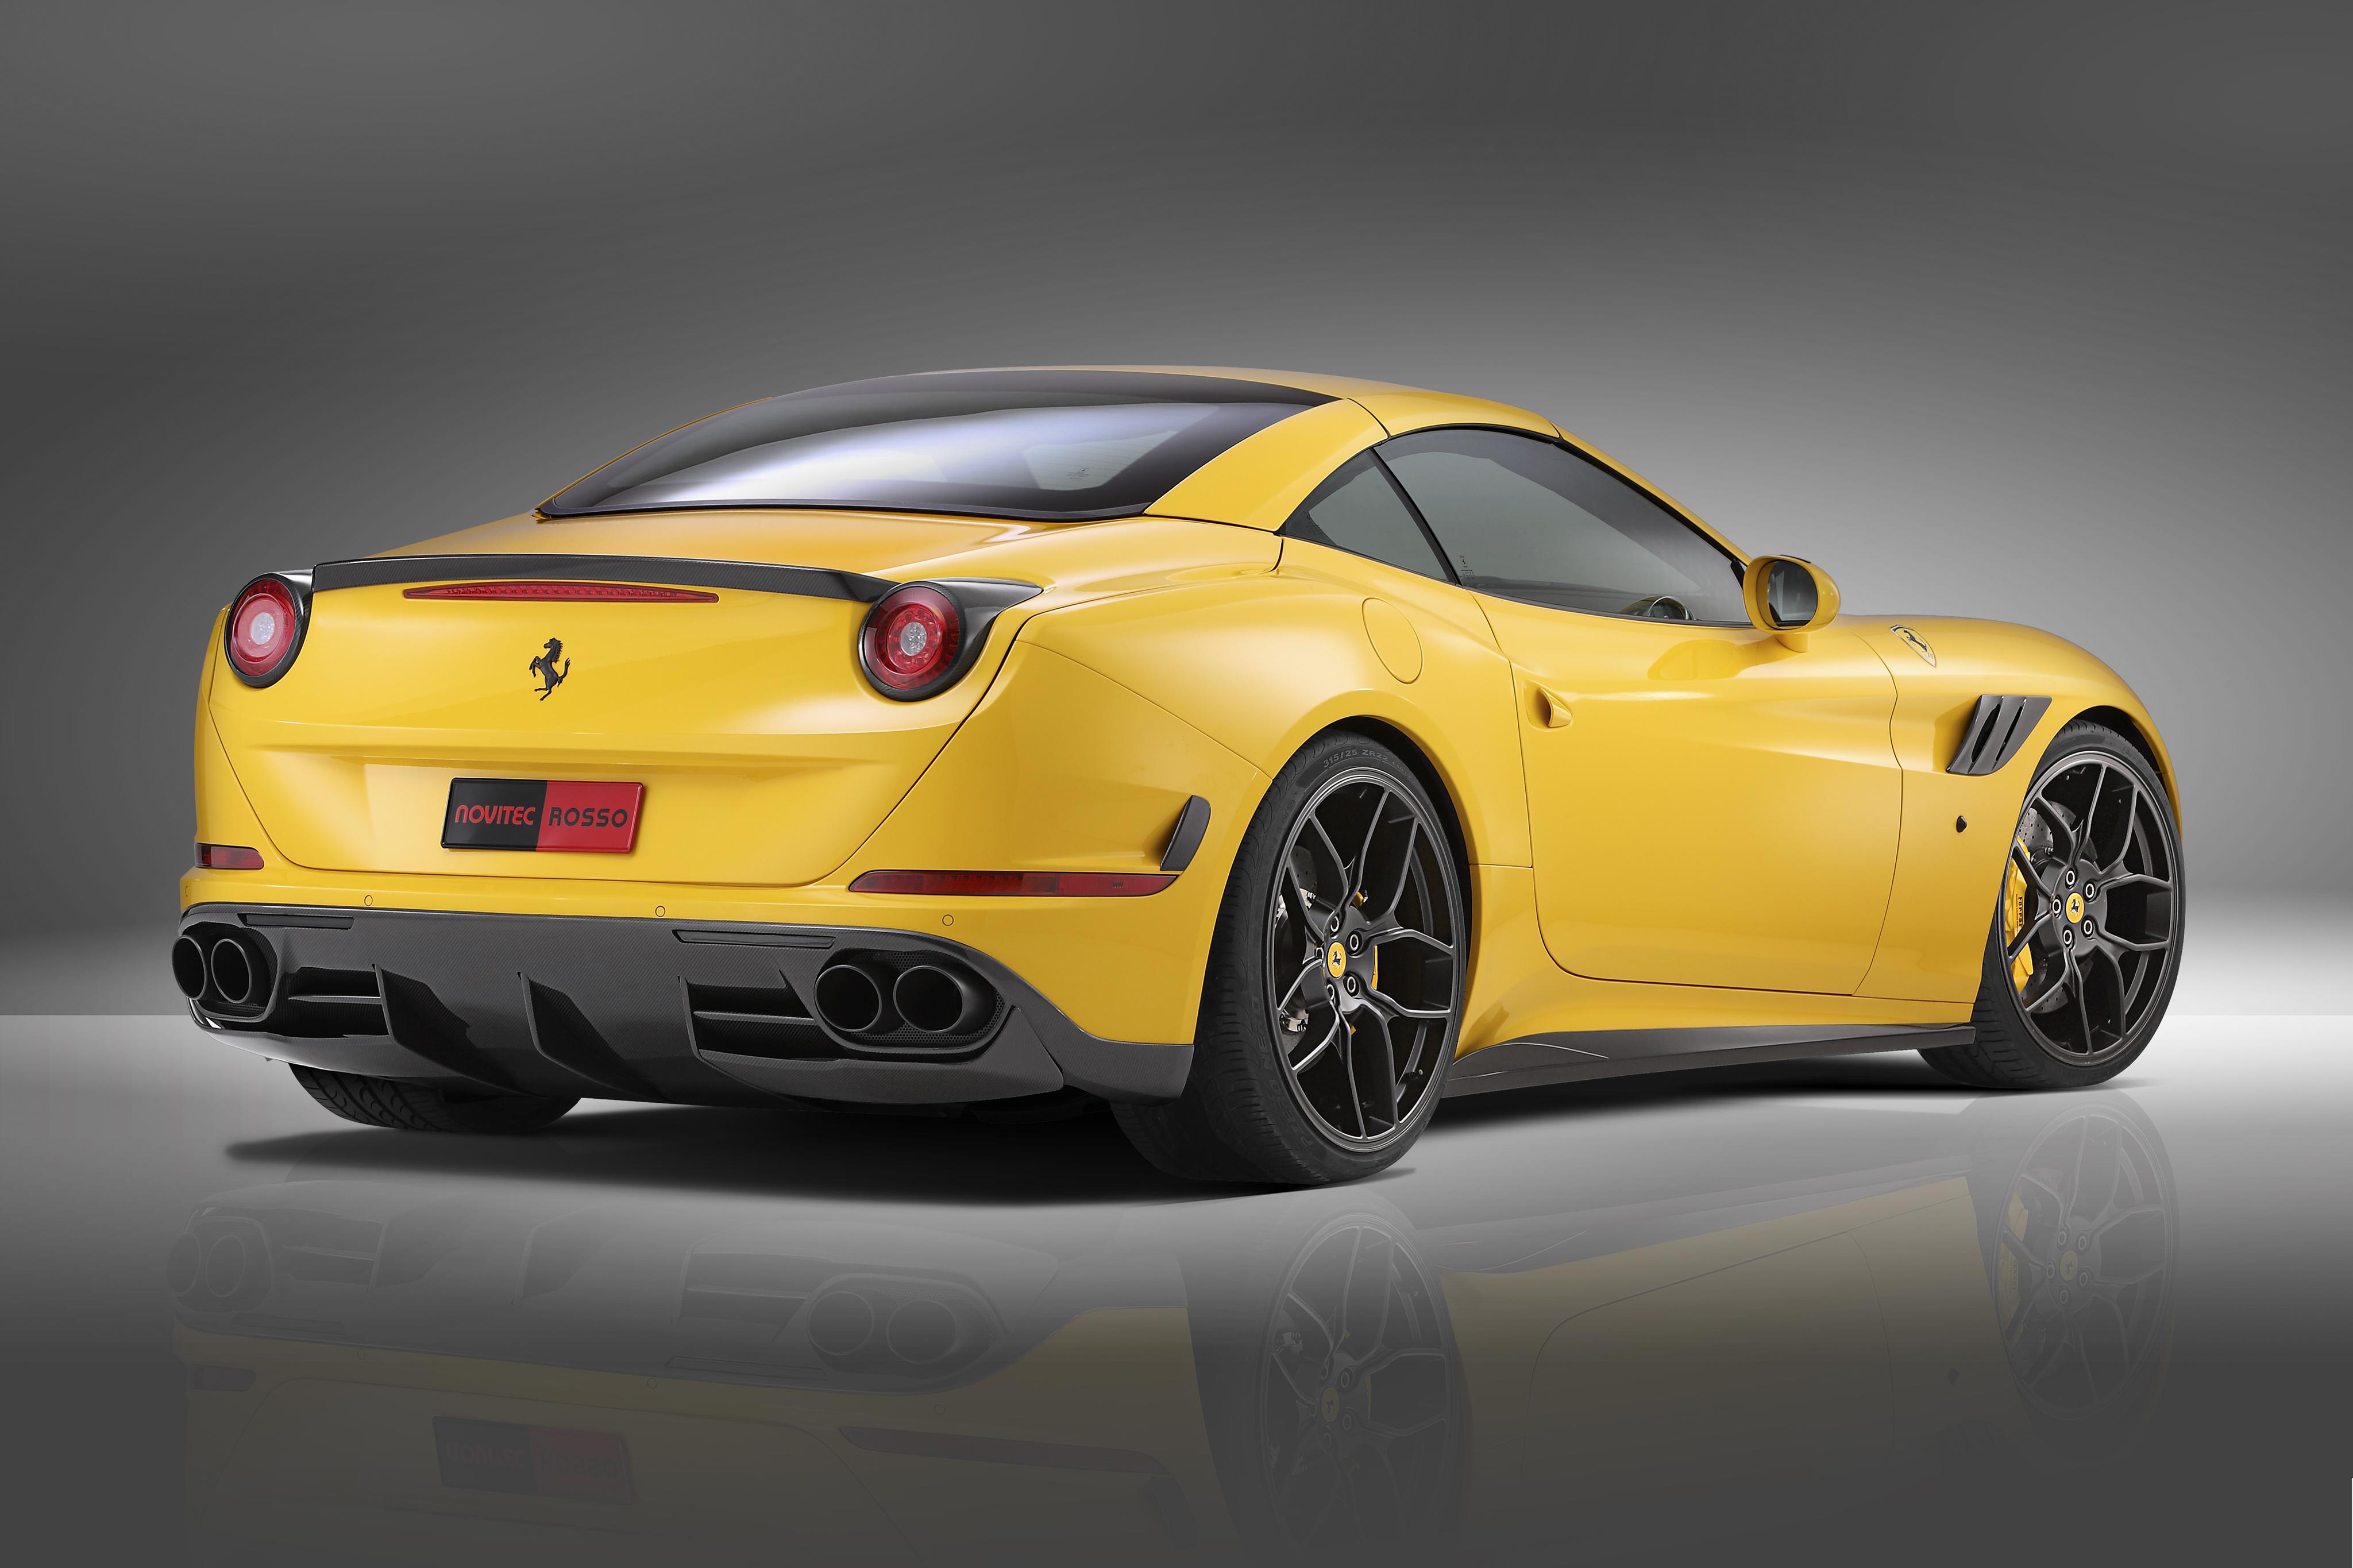 Ferrari California T Wallpapers, Pictures, Images